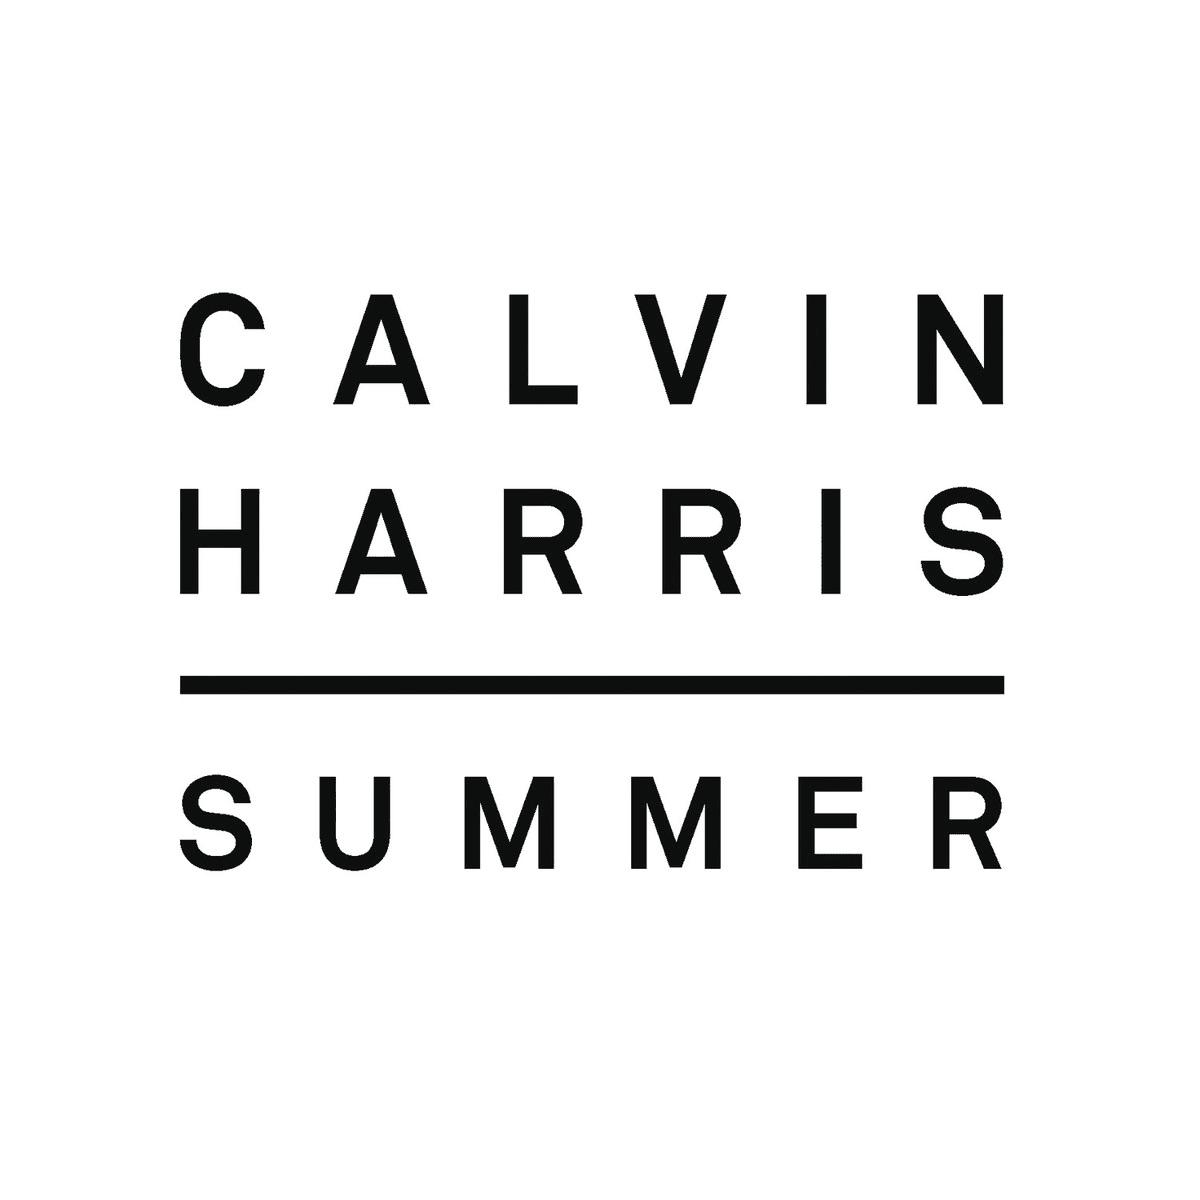 Calvin Harris Summer